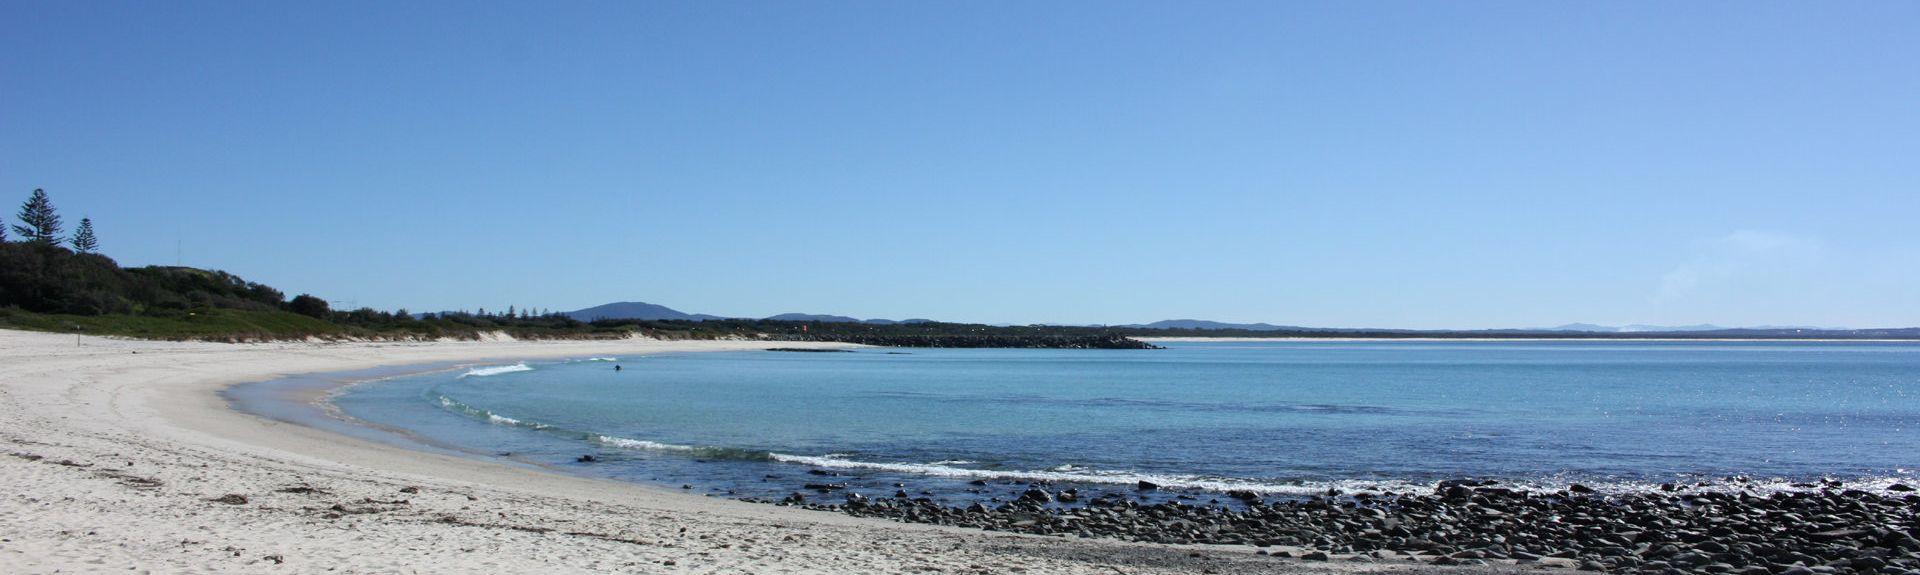 Diamond Beach NSW, Australia